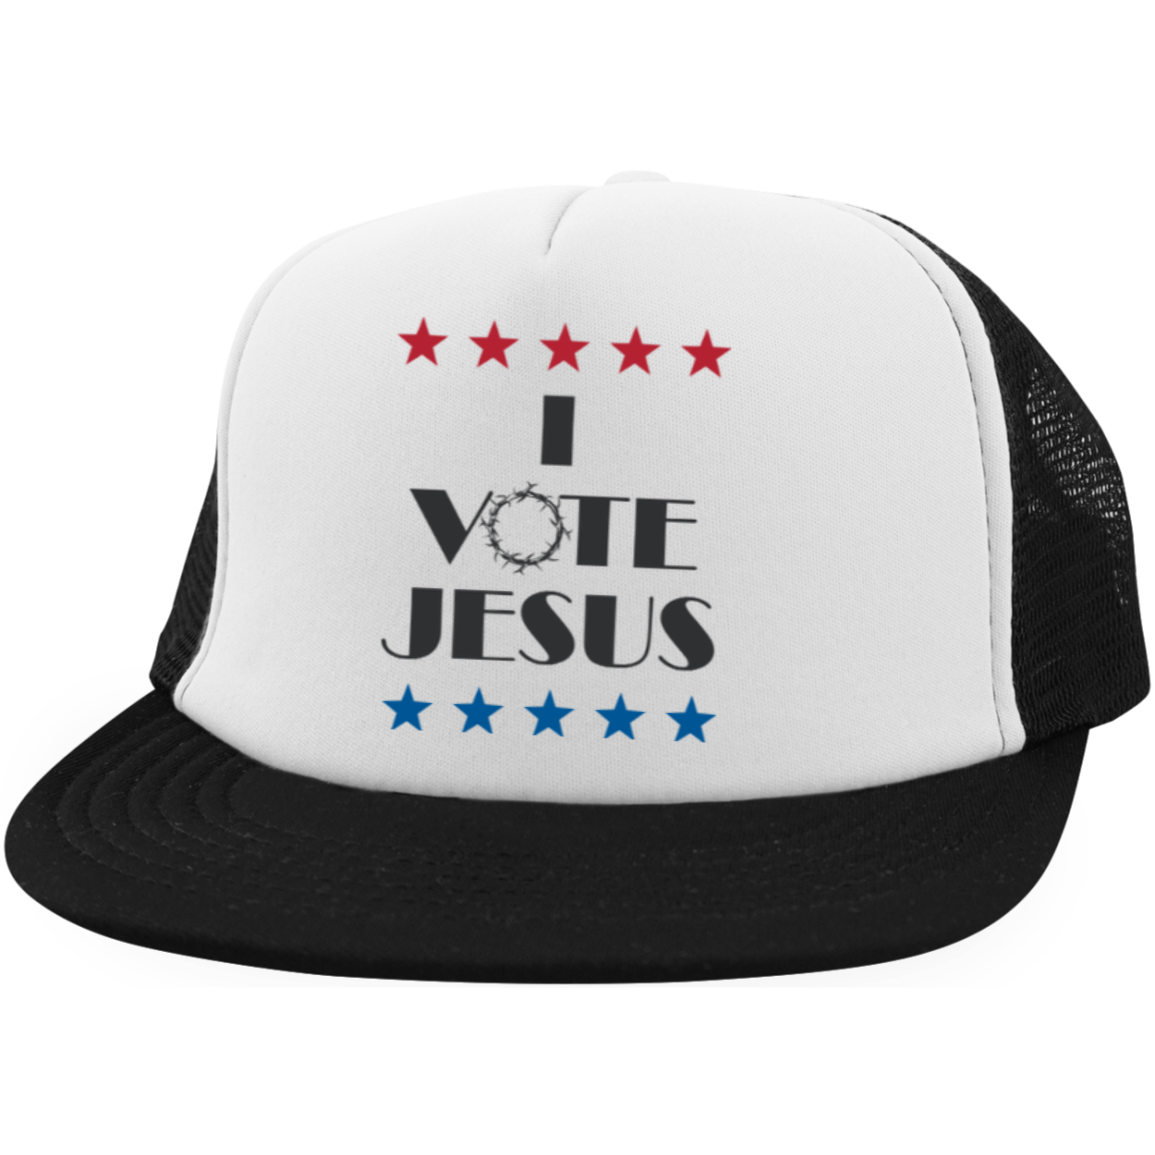 I Vote Jesus - Trucker Hat with Snapback  1bf866f15de2